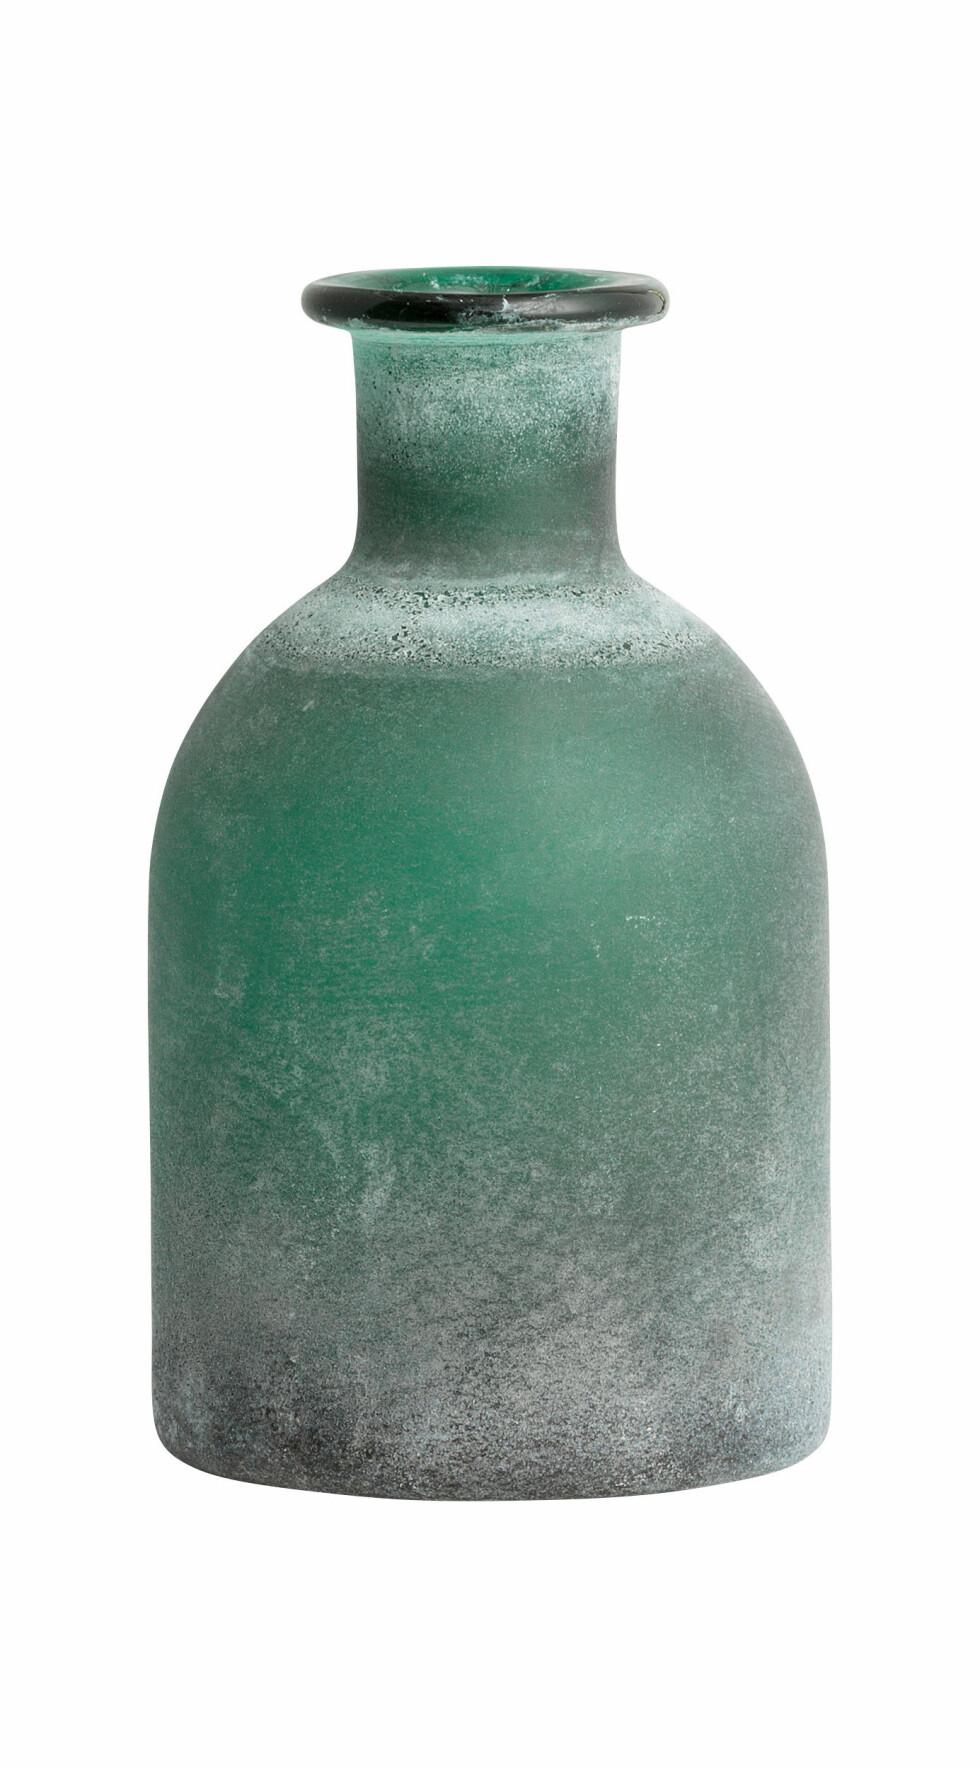 Vase med tykk mage (kr 80, hm.no). Foto: Produsenten